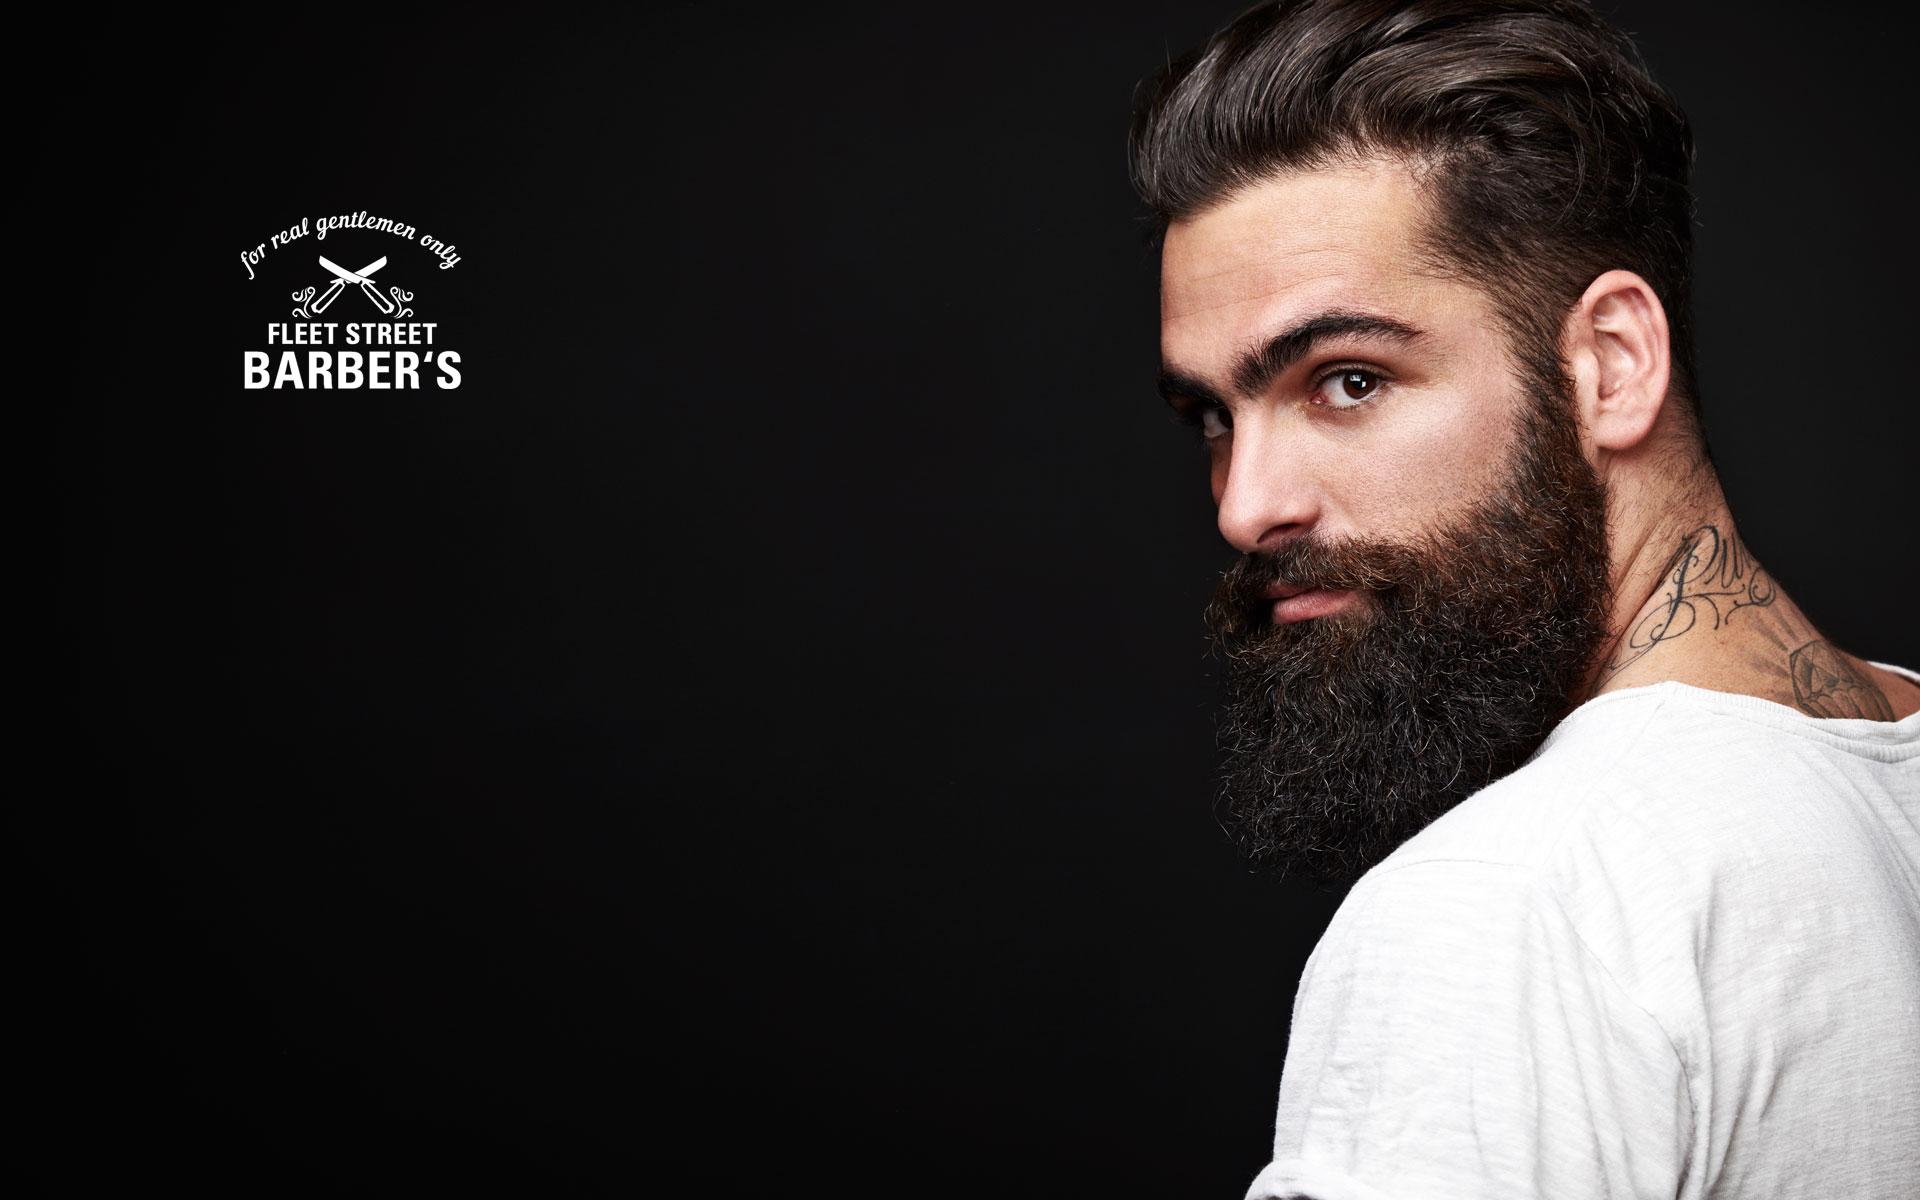 fleet street barbers